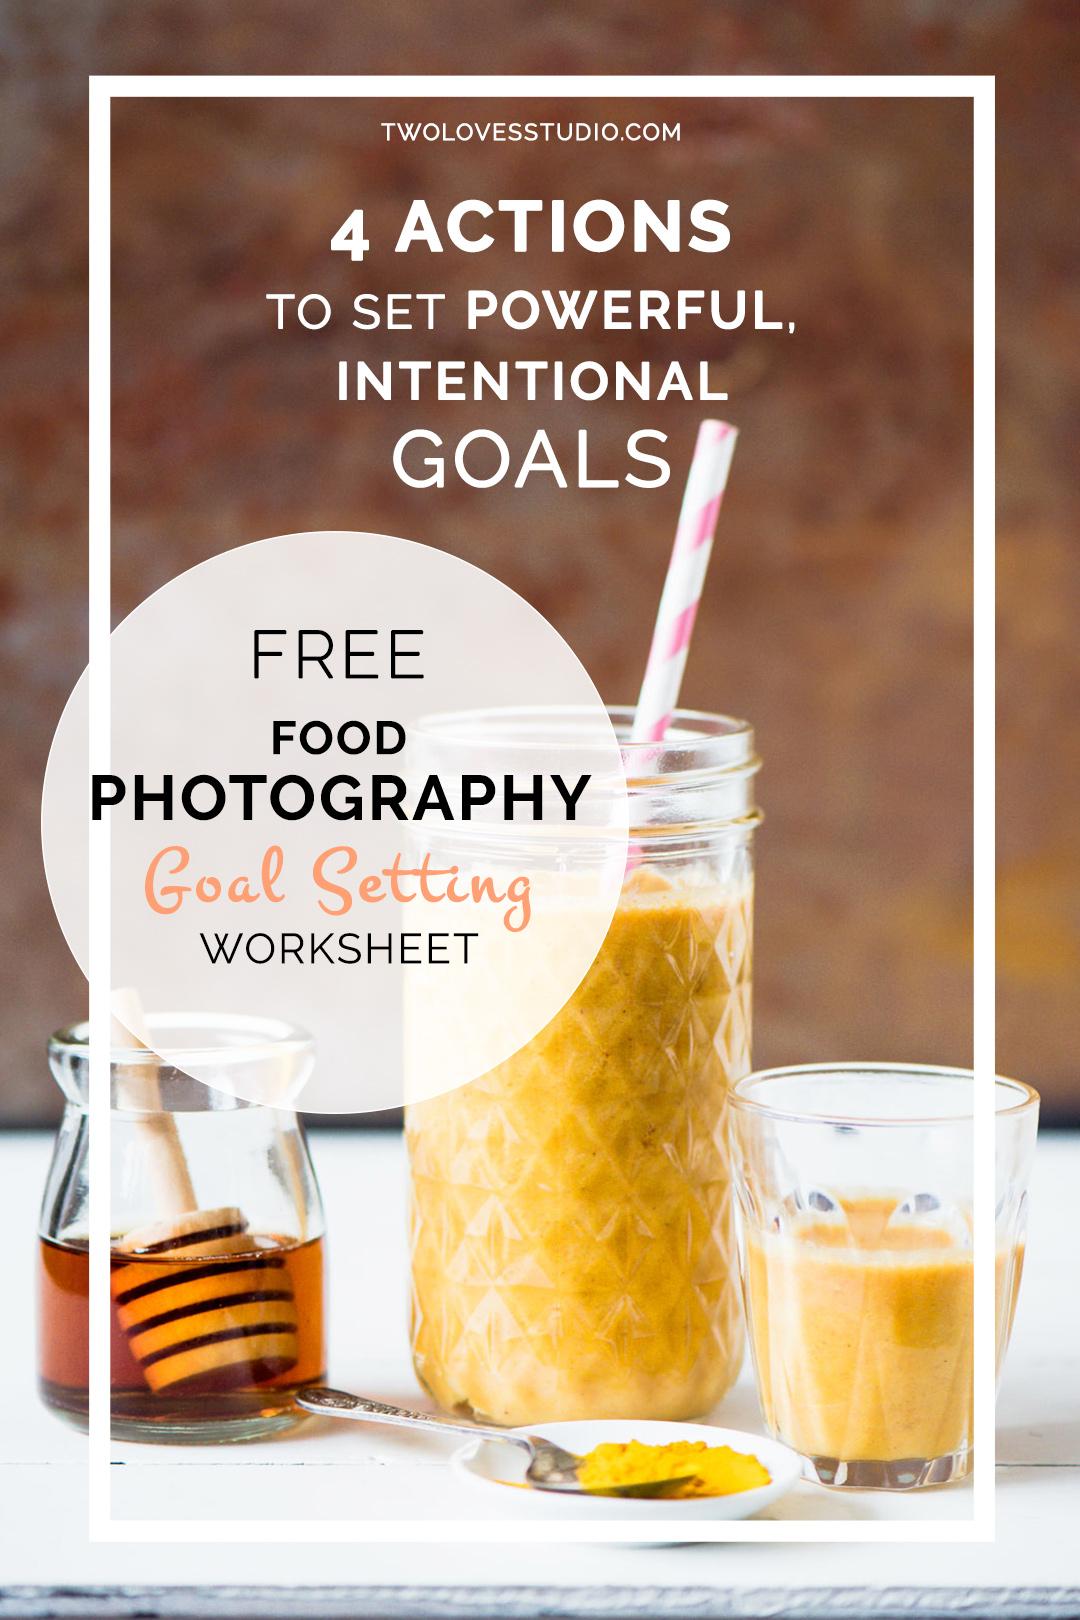 Free Food Photography Goal Setting Worksheet